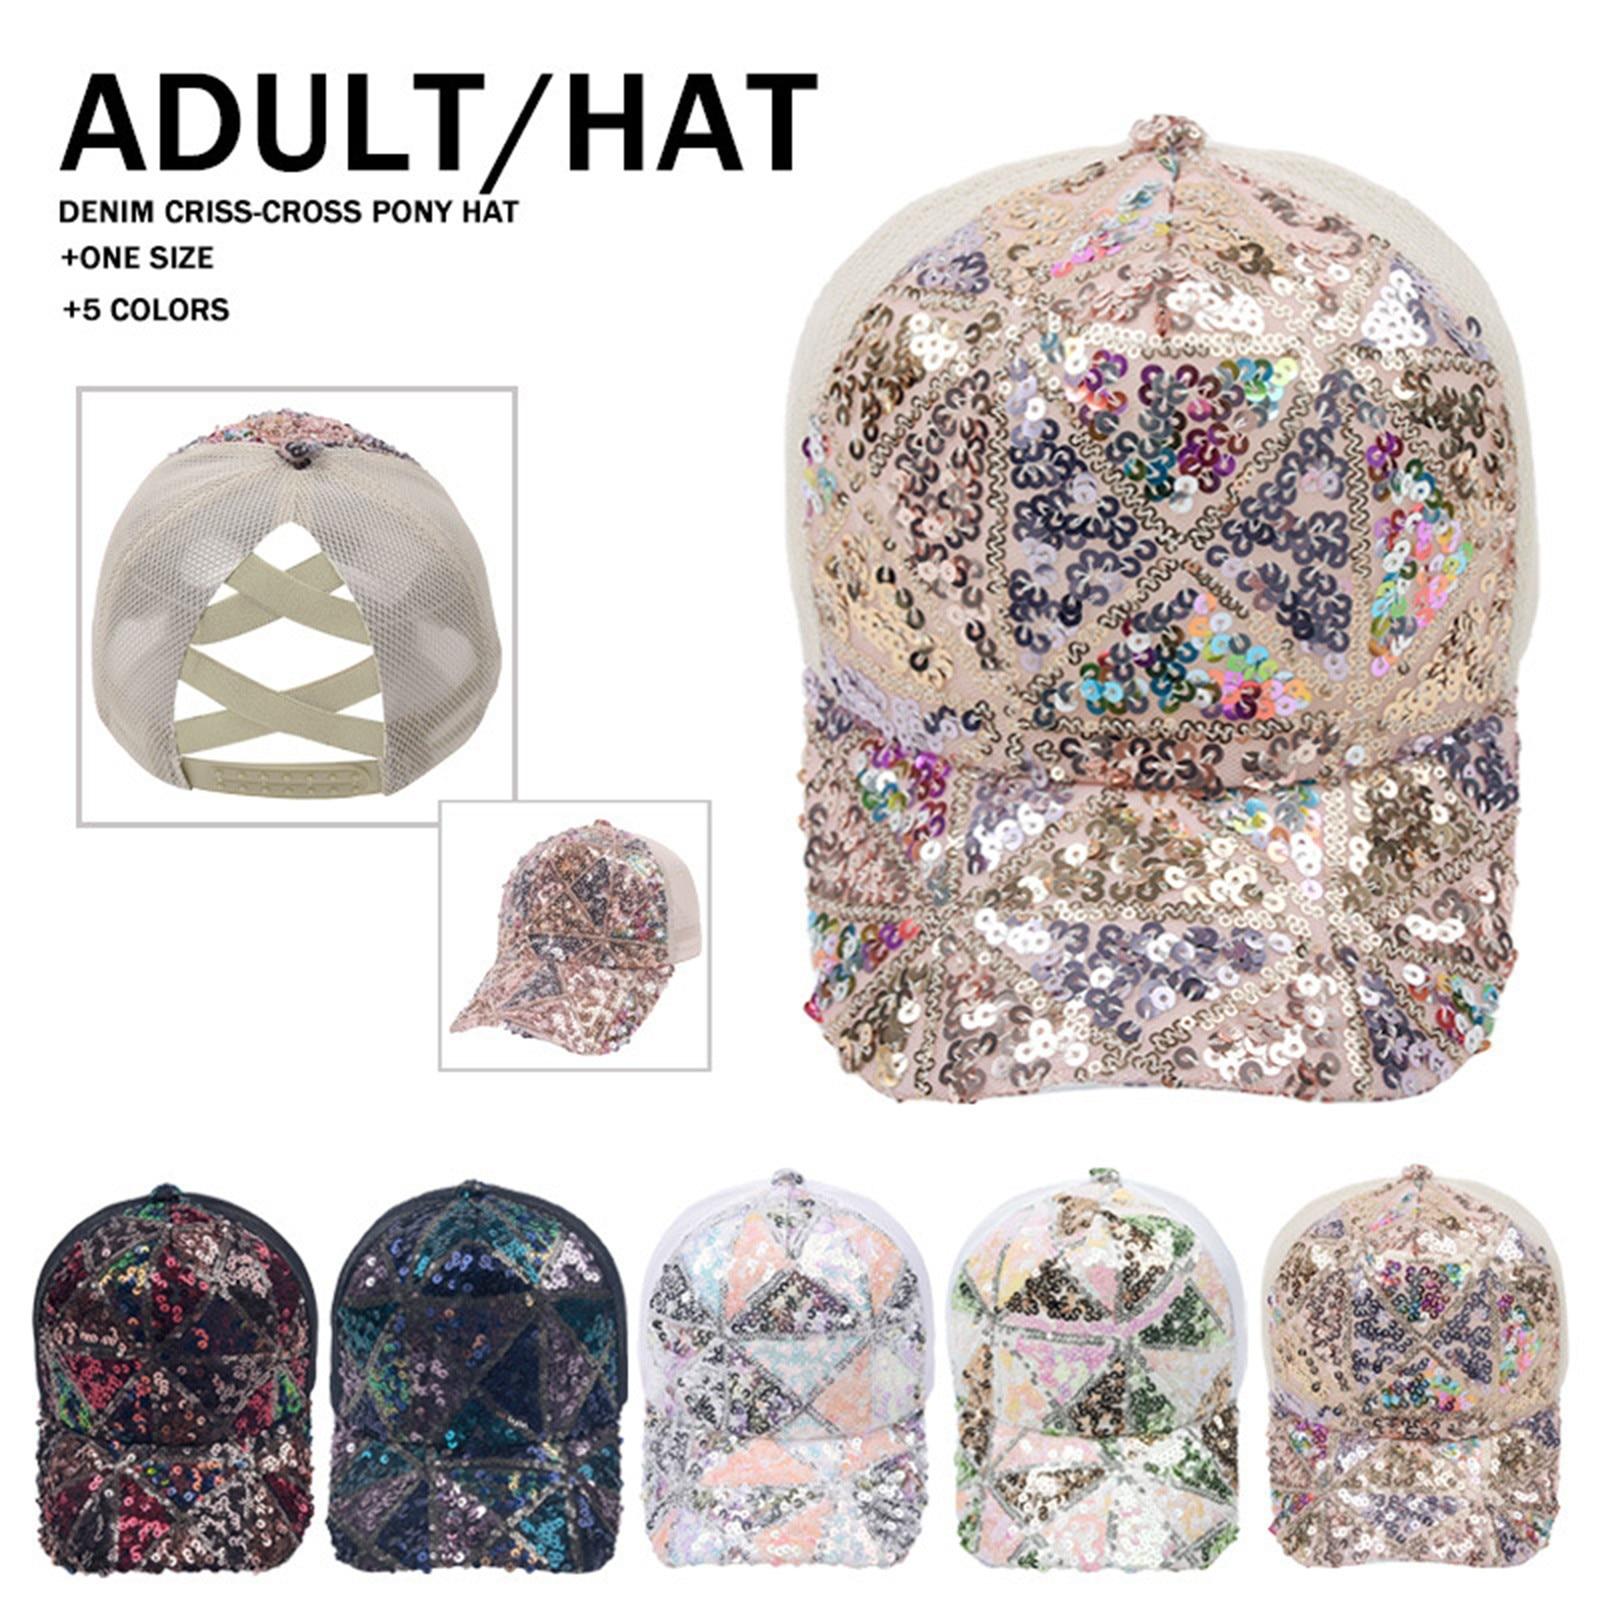 Summer Hat Fashion Unisex Men Women Tie-dyed Sun Hat Adjustable Baseball Cap Hip Hop Hat Cap Female sun visor Luxury cap